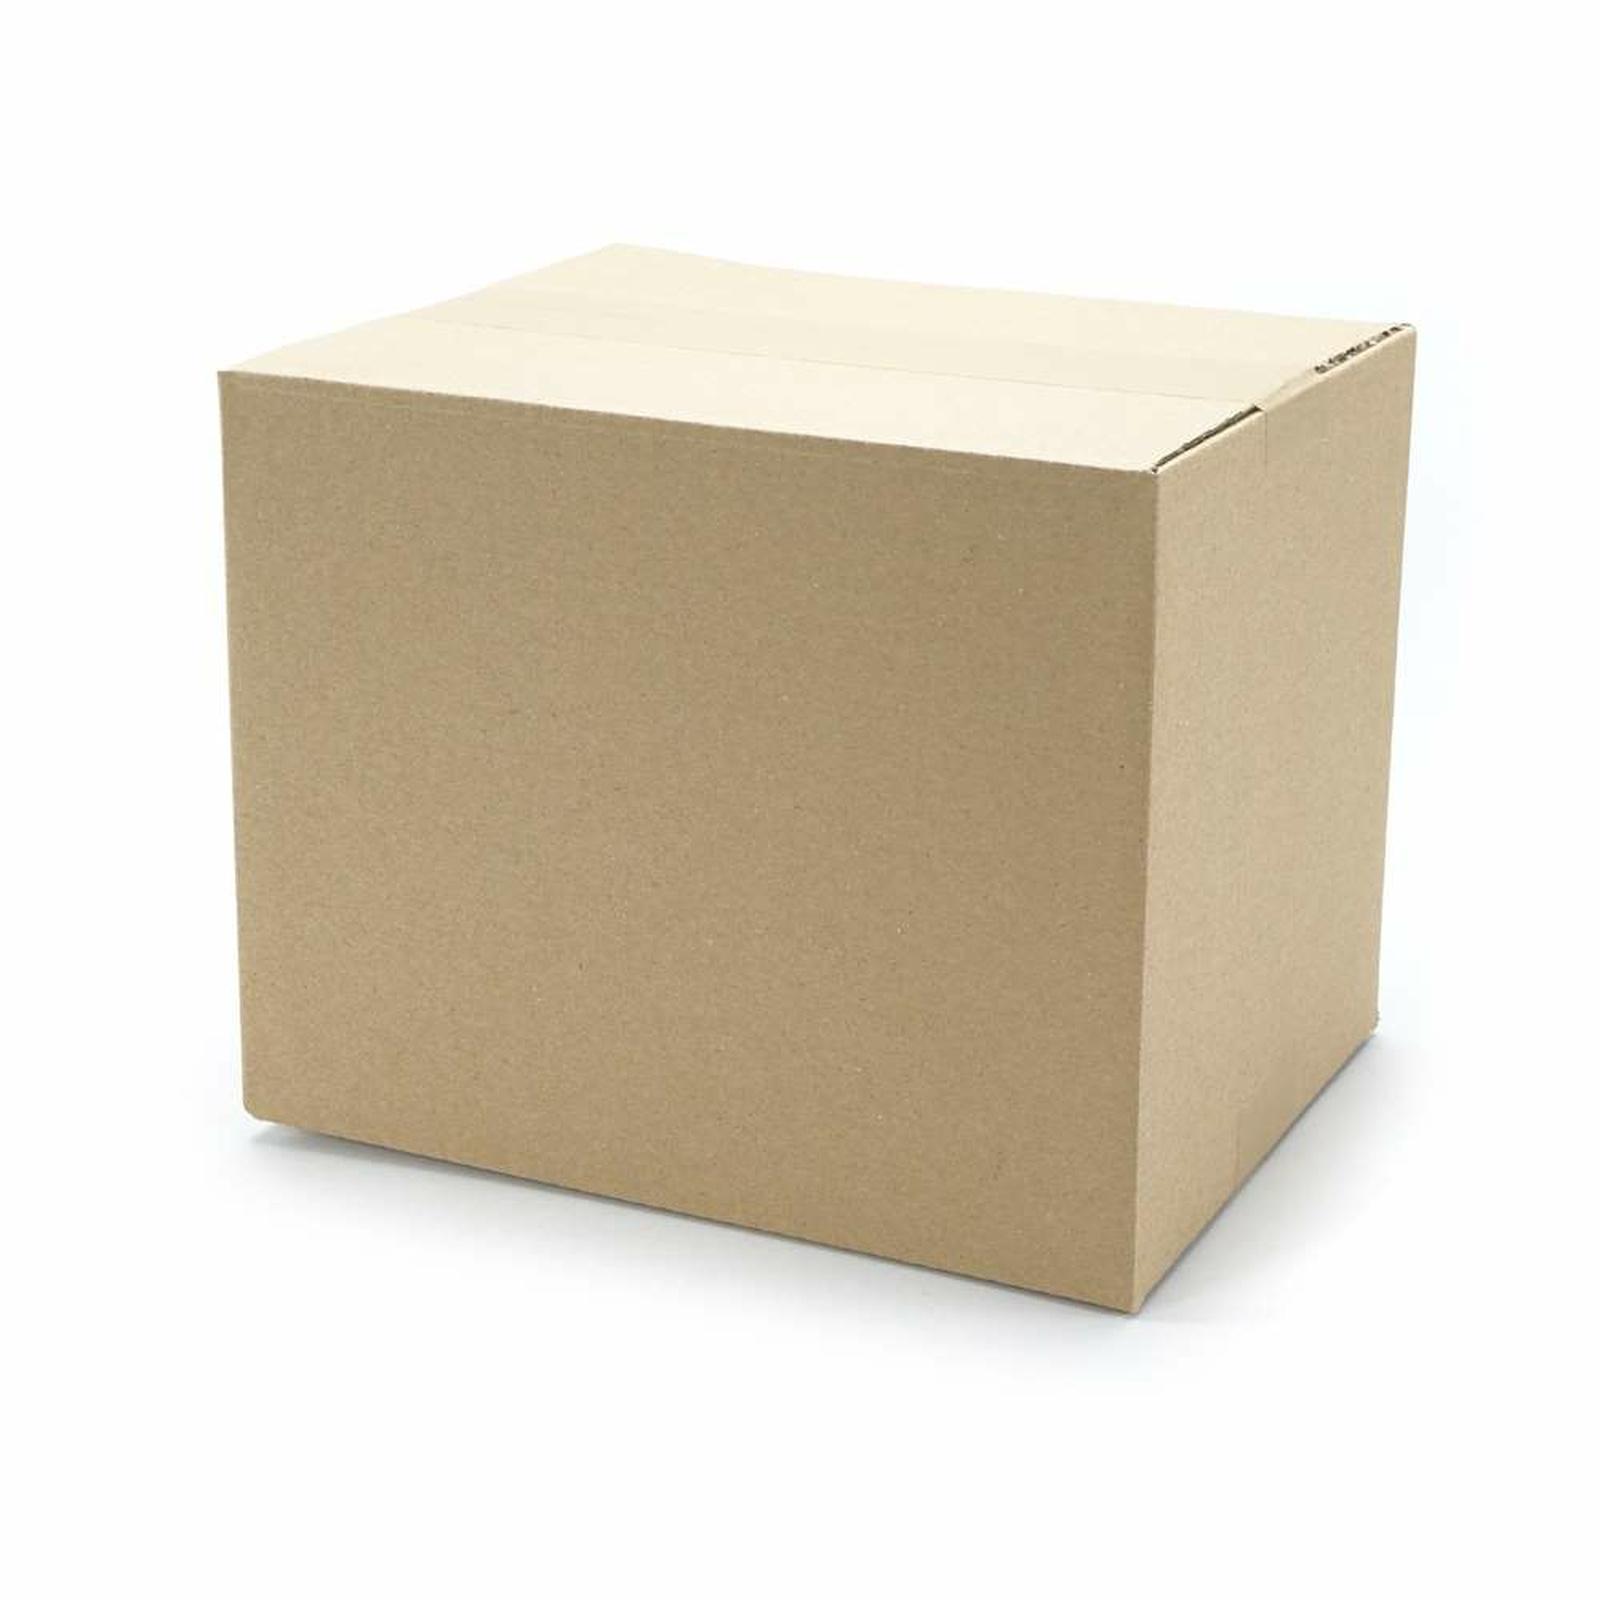 einwellige kartons 250x200x200 mm g nstig kaufen 0 27. Black Bedroom Furniture Sets. Home Design Ideas